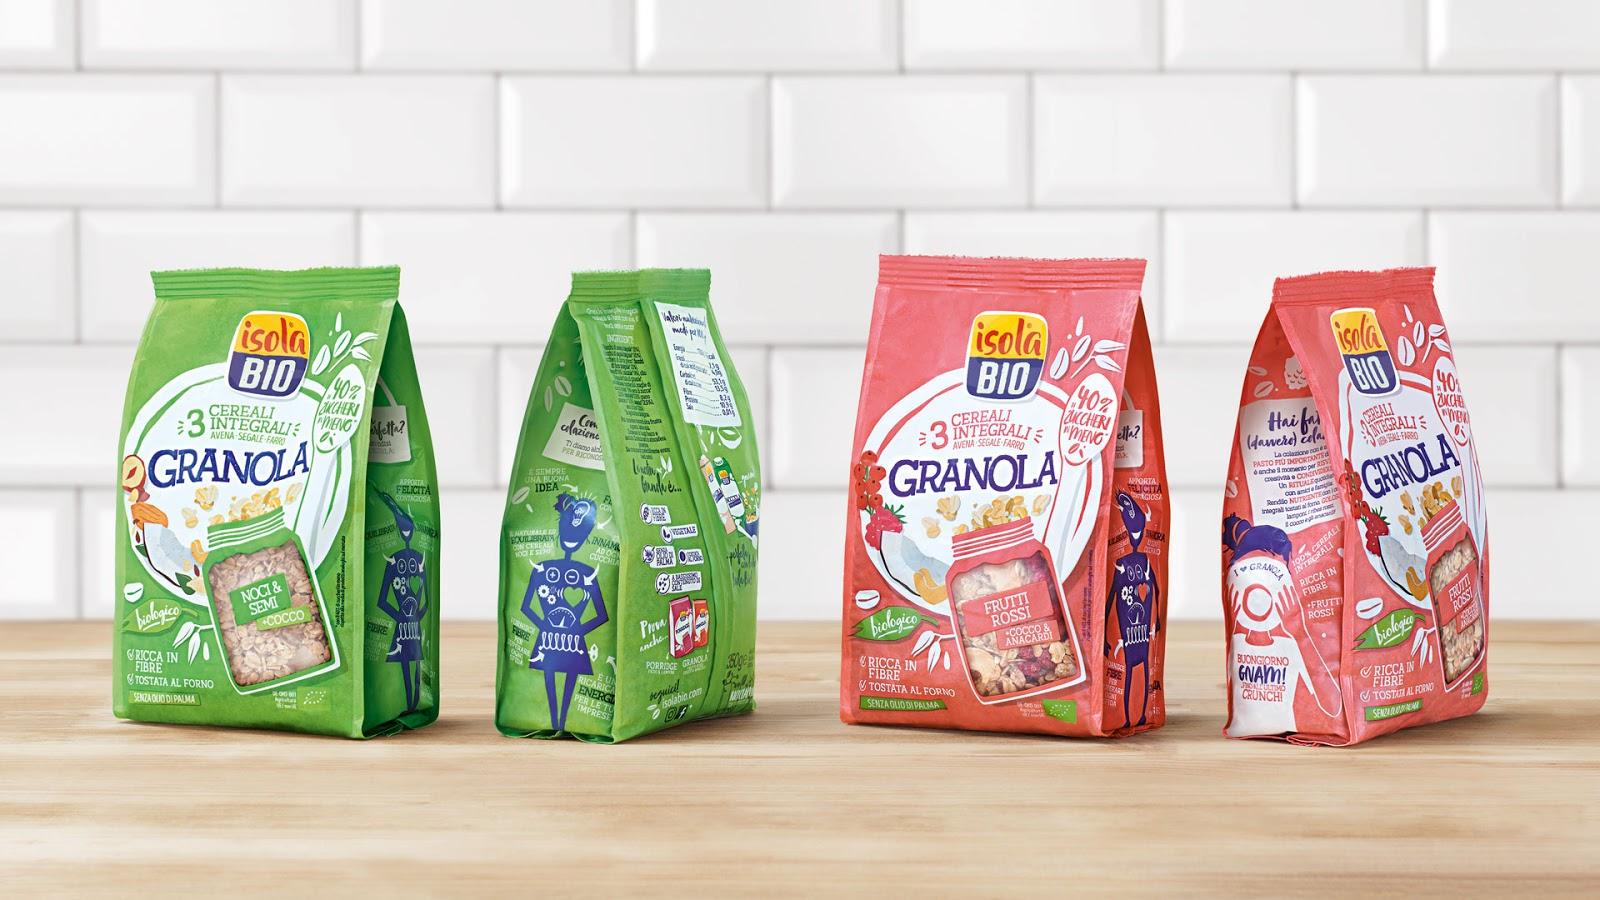 Isola Bio谷物饮料包装设计